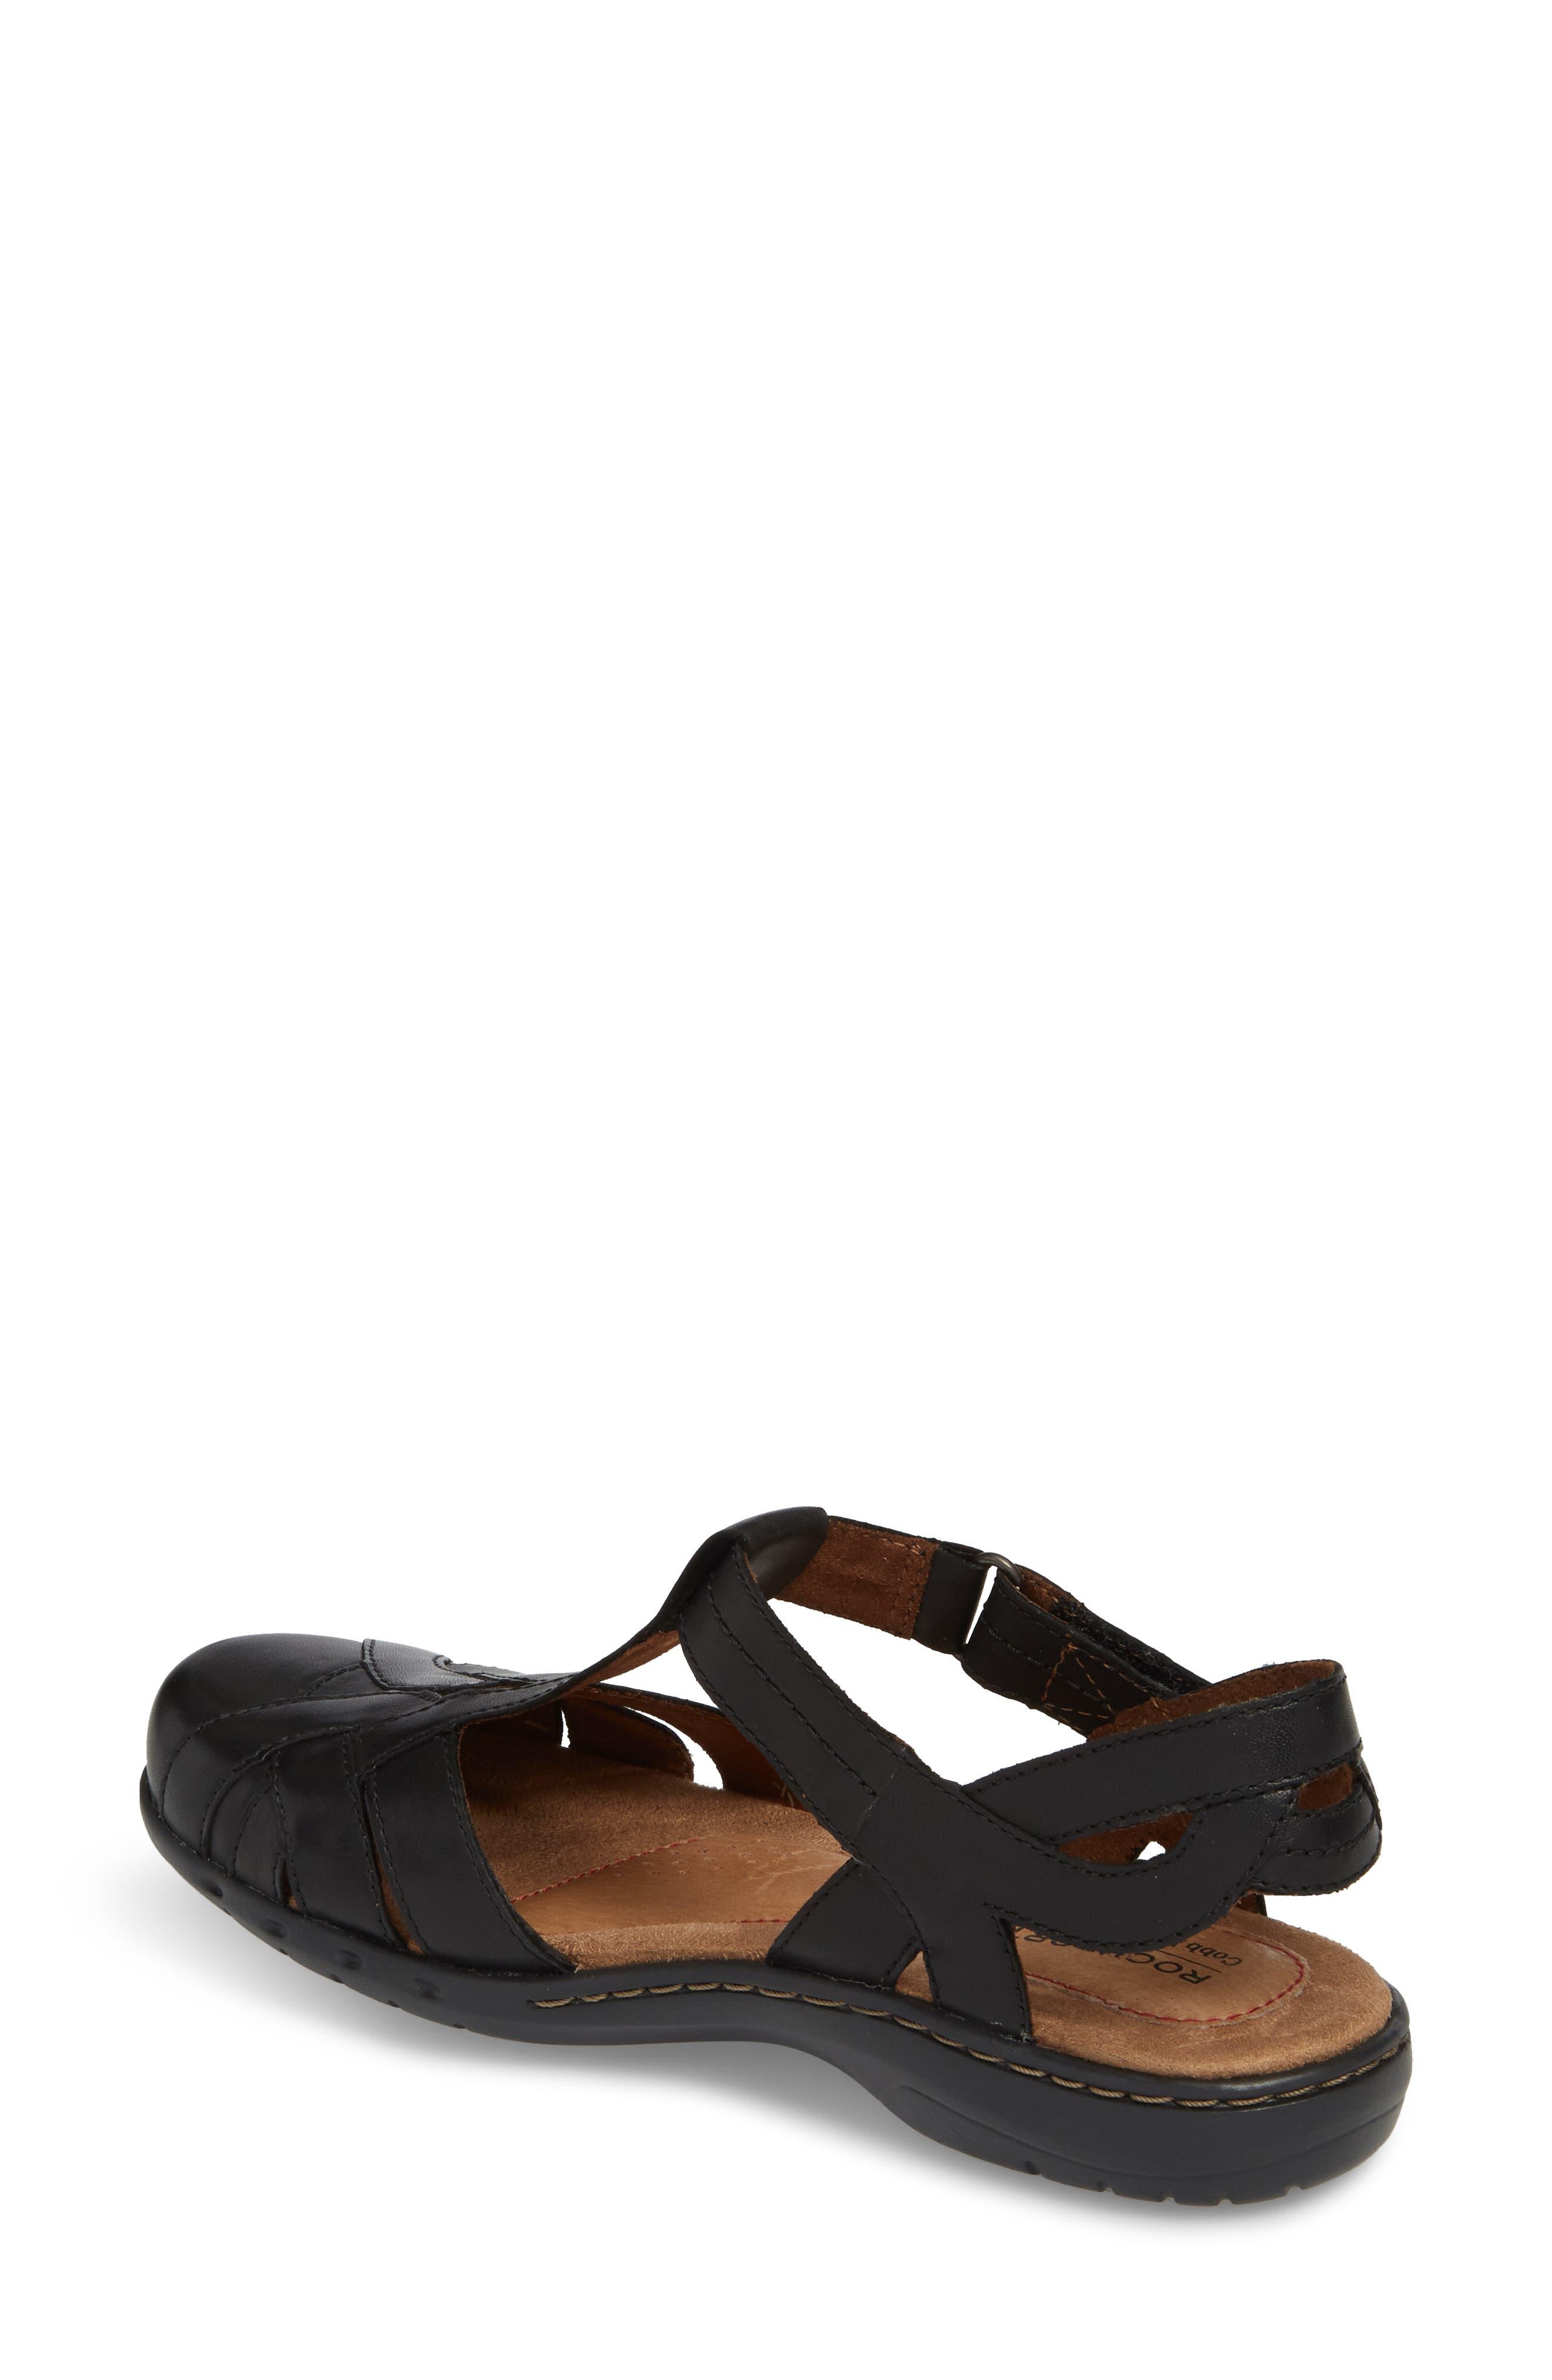 Penefield T-Strap Sandal,                             Alternate thumbnail 2, color,                             BLACK LEATHER